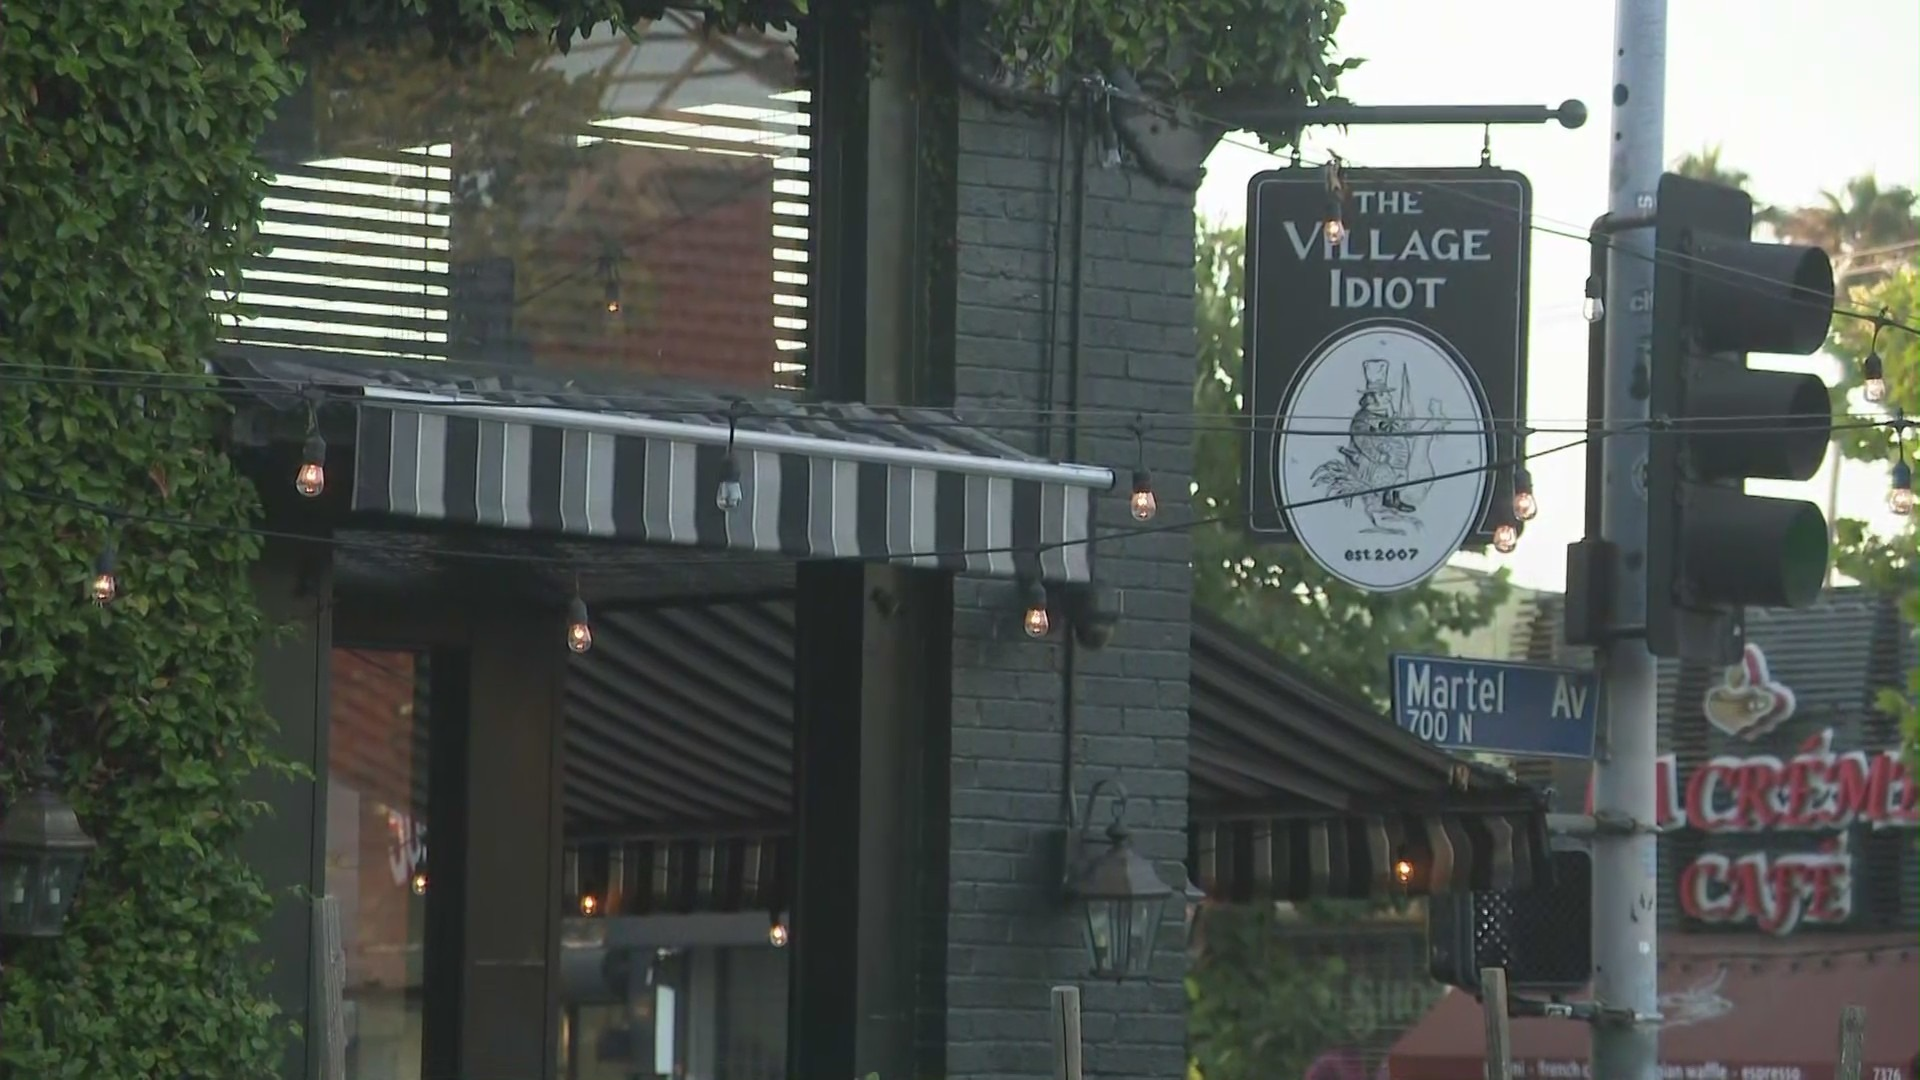 The Village Idiot in the Fairfax District is seen on July 22, 2021. (KTLA)